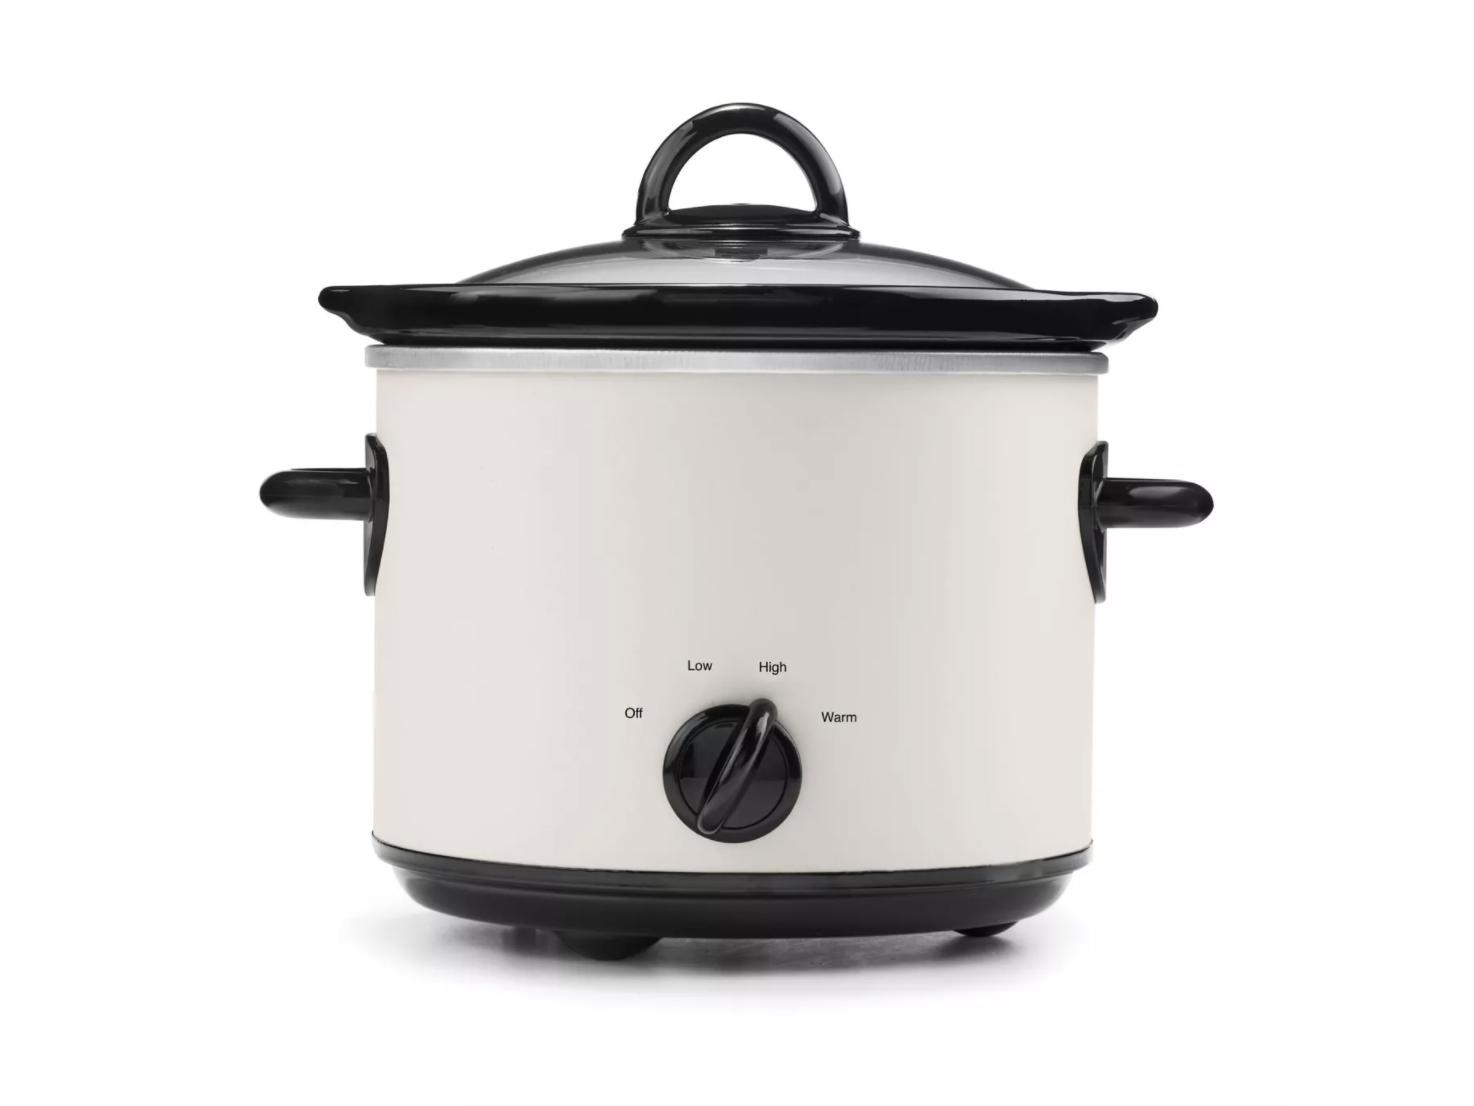 Crock Pot Slow Cooker Only $15.00 (Reg $17.99) + Free Store Pickup at Target.com!